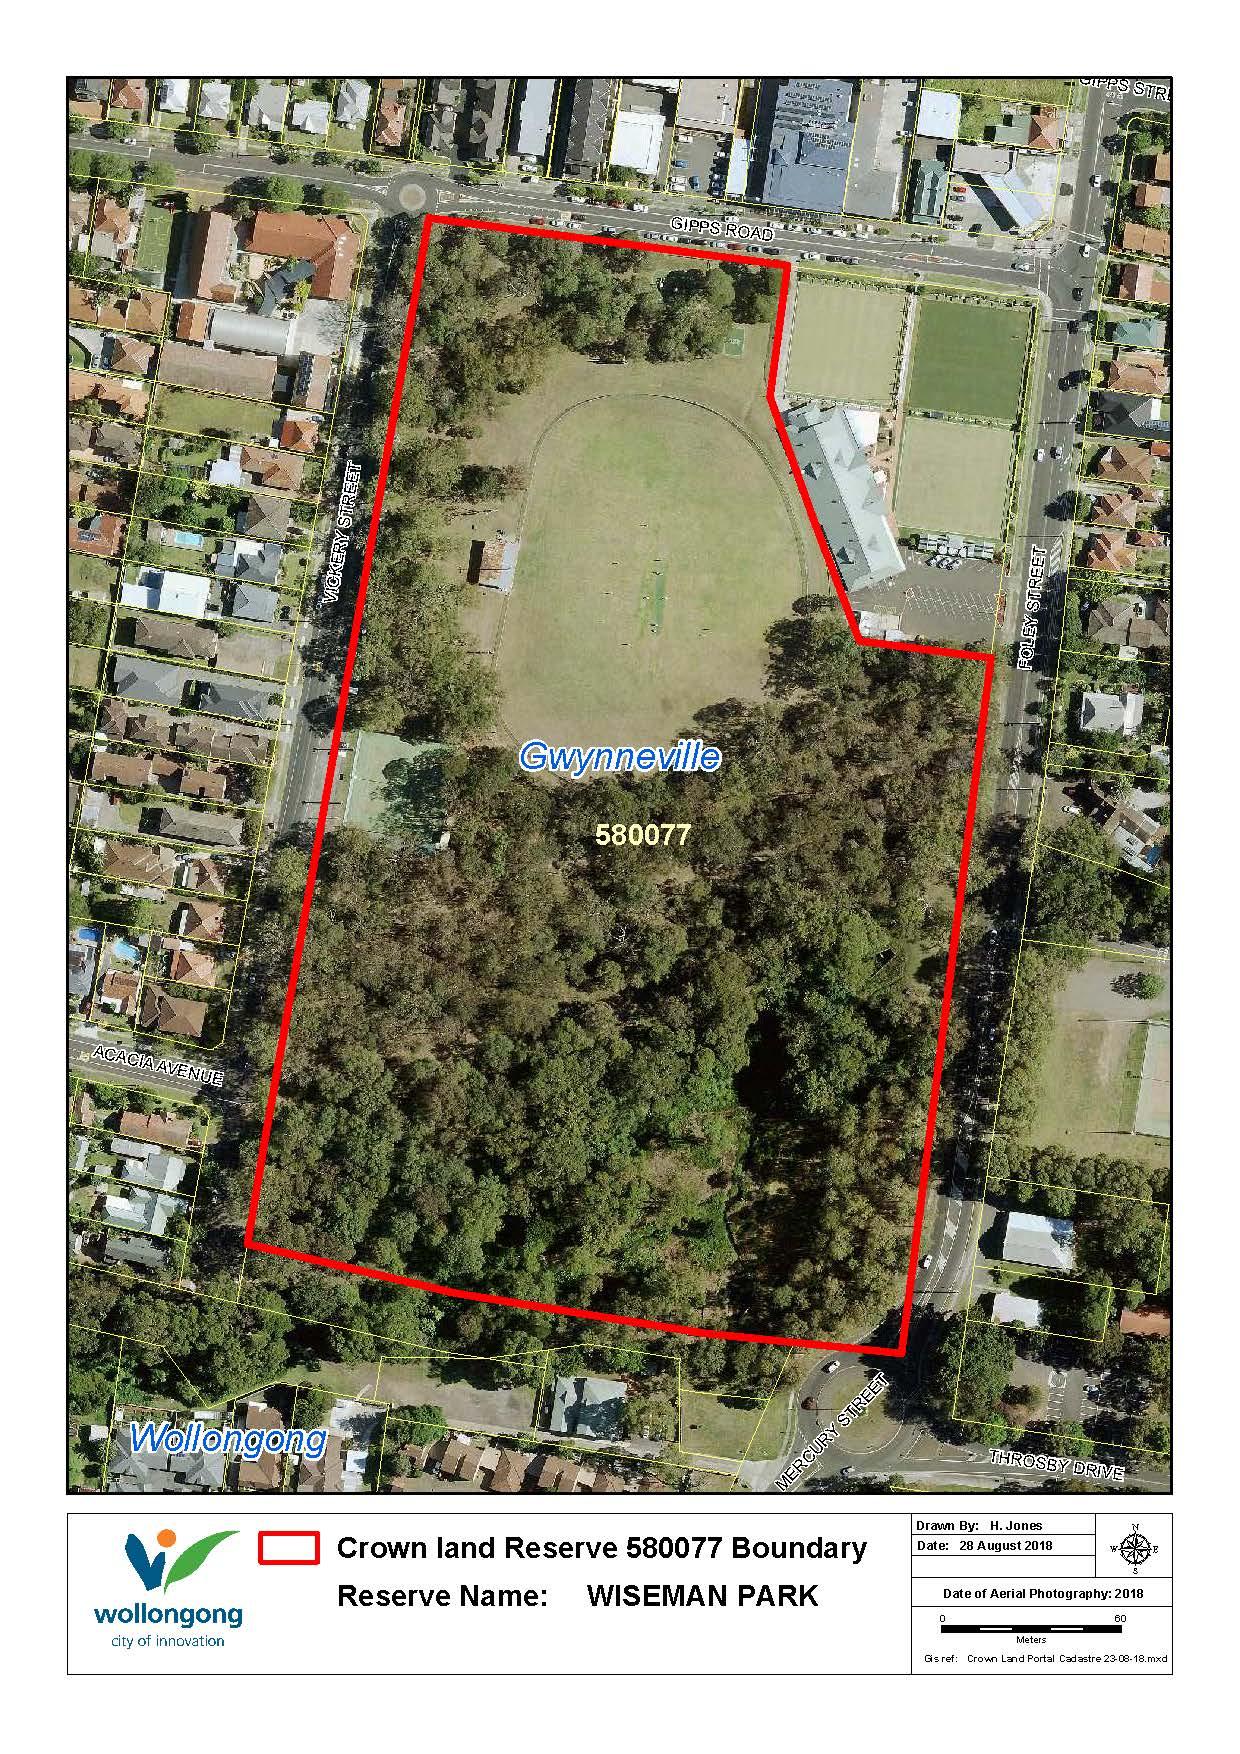 Wiseman park reserve 580077 map z19 93157